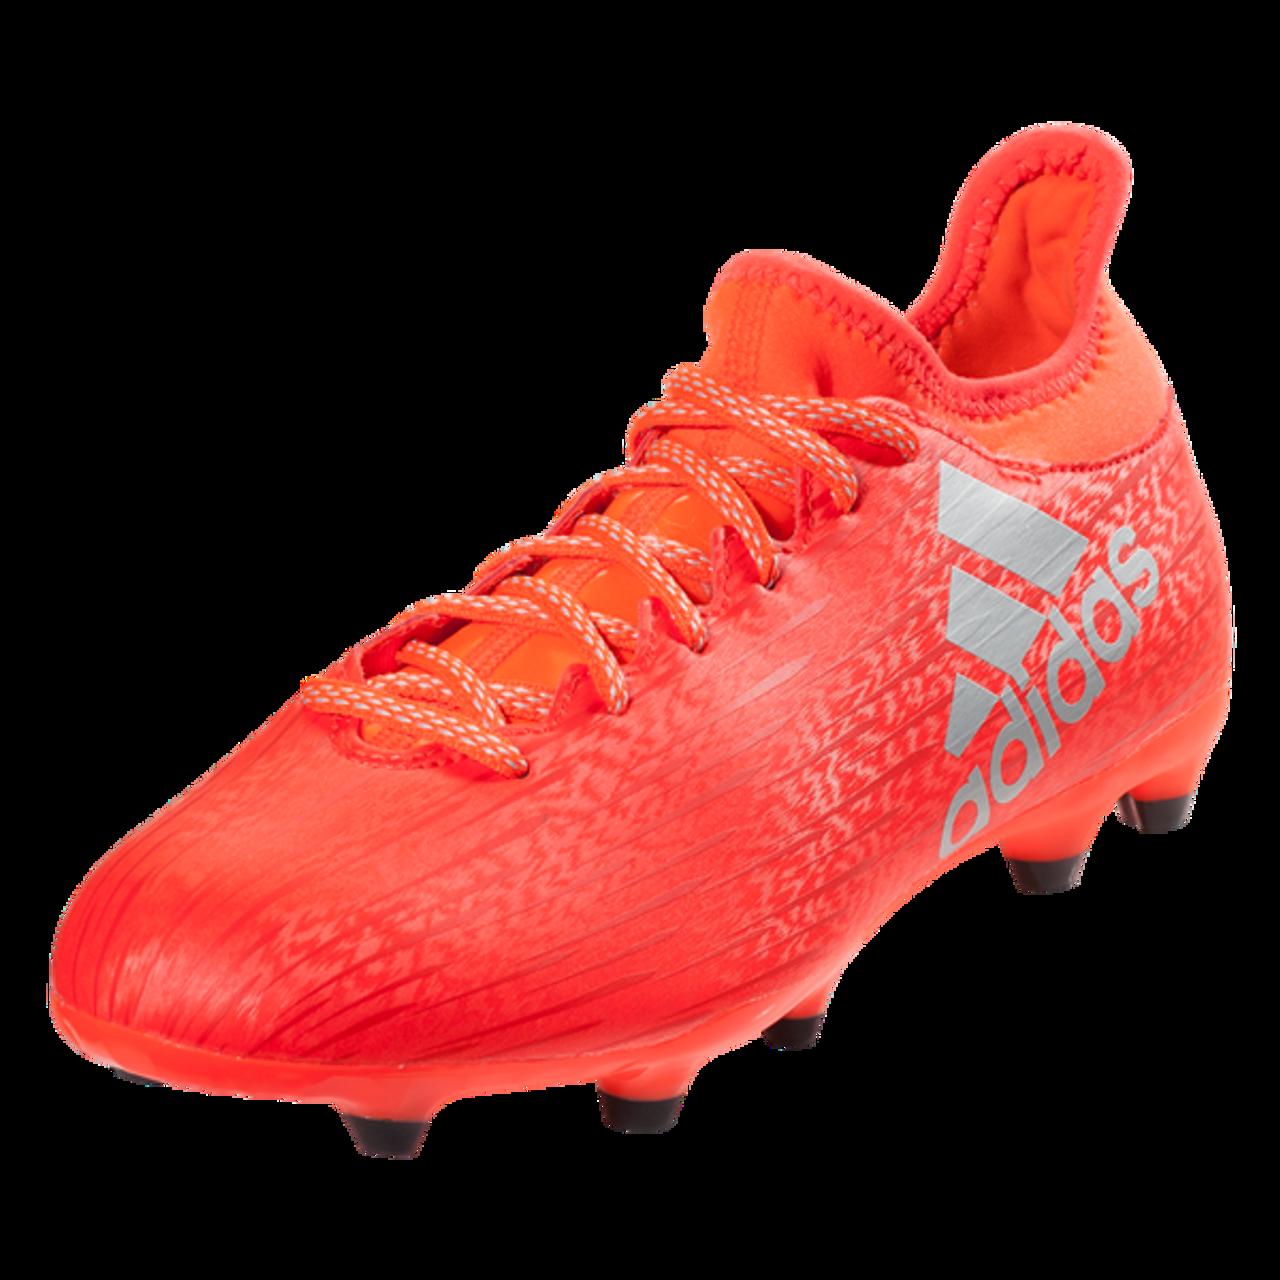 adidas X 16.3 FG - Solar Red (11917) - ohp soccer 6c9202815972